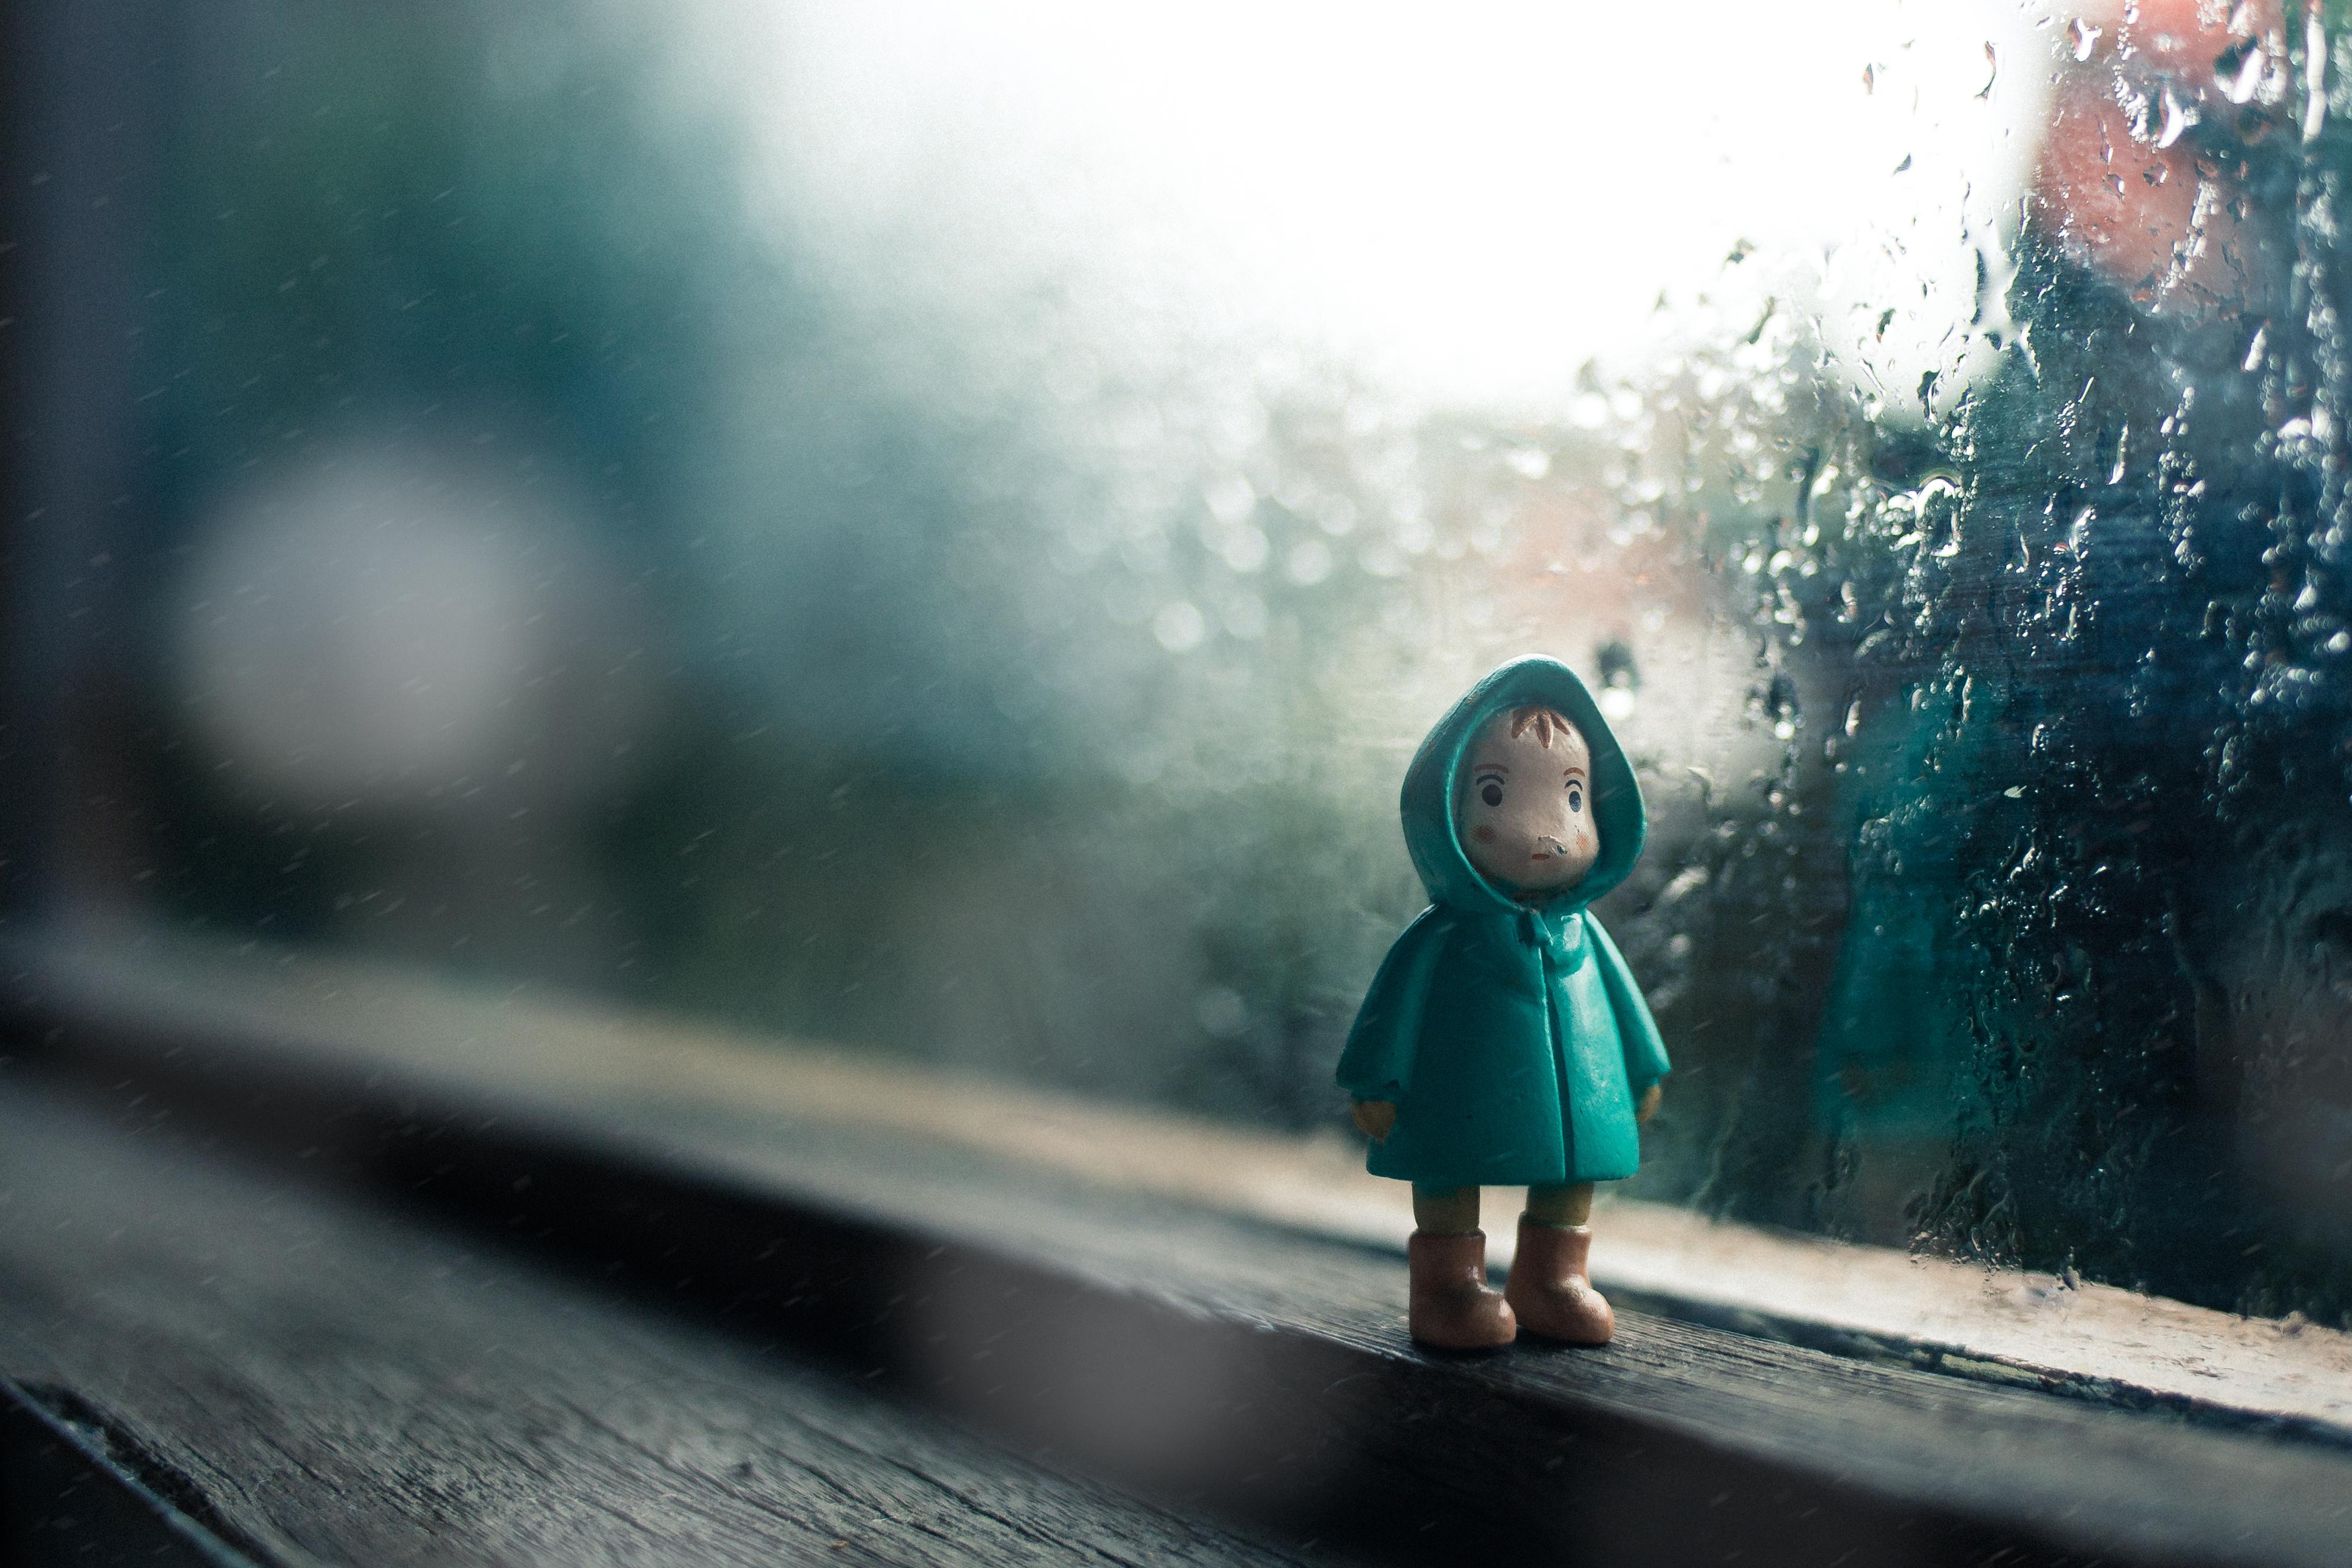 Holzfigur am Fenster, Regenwetter